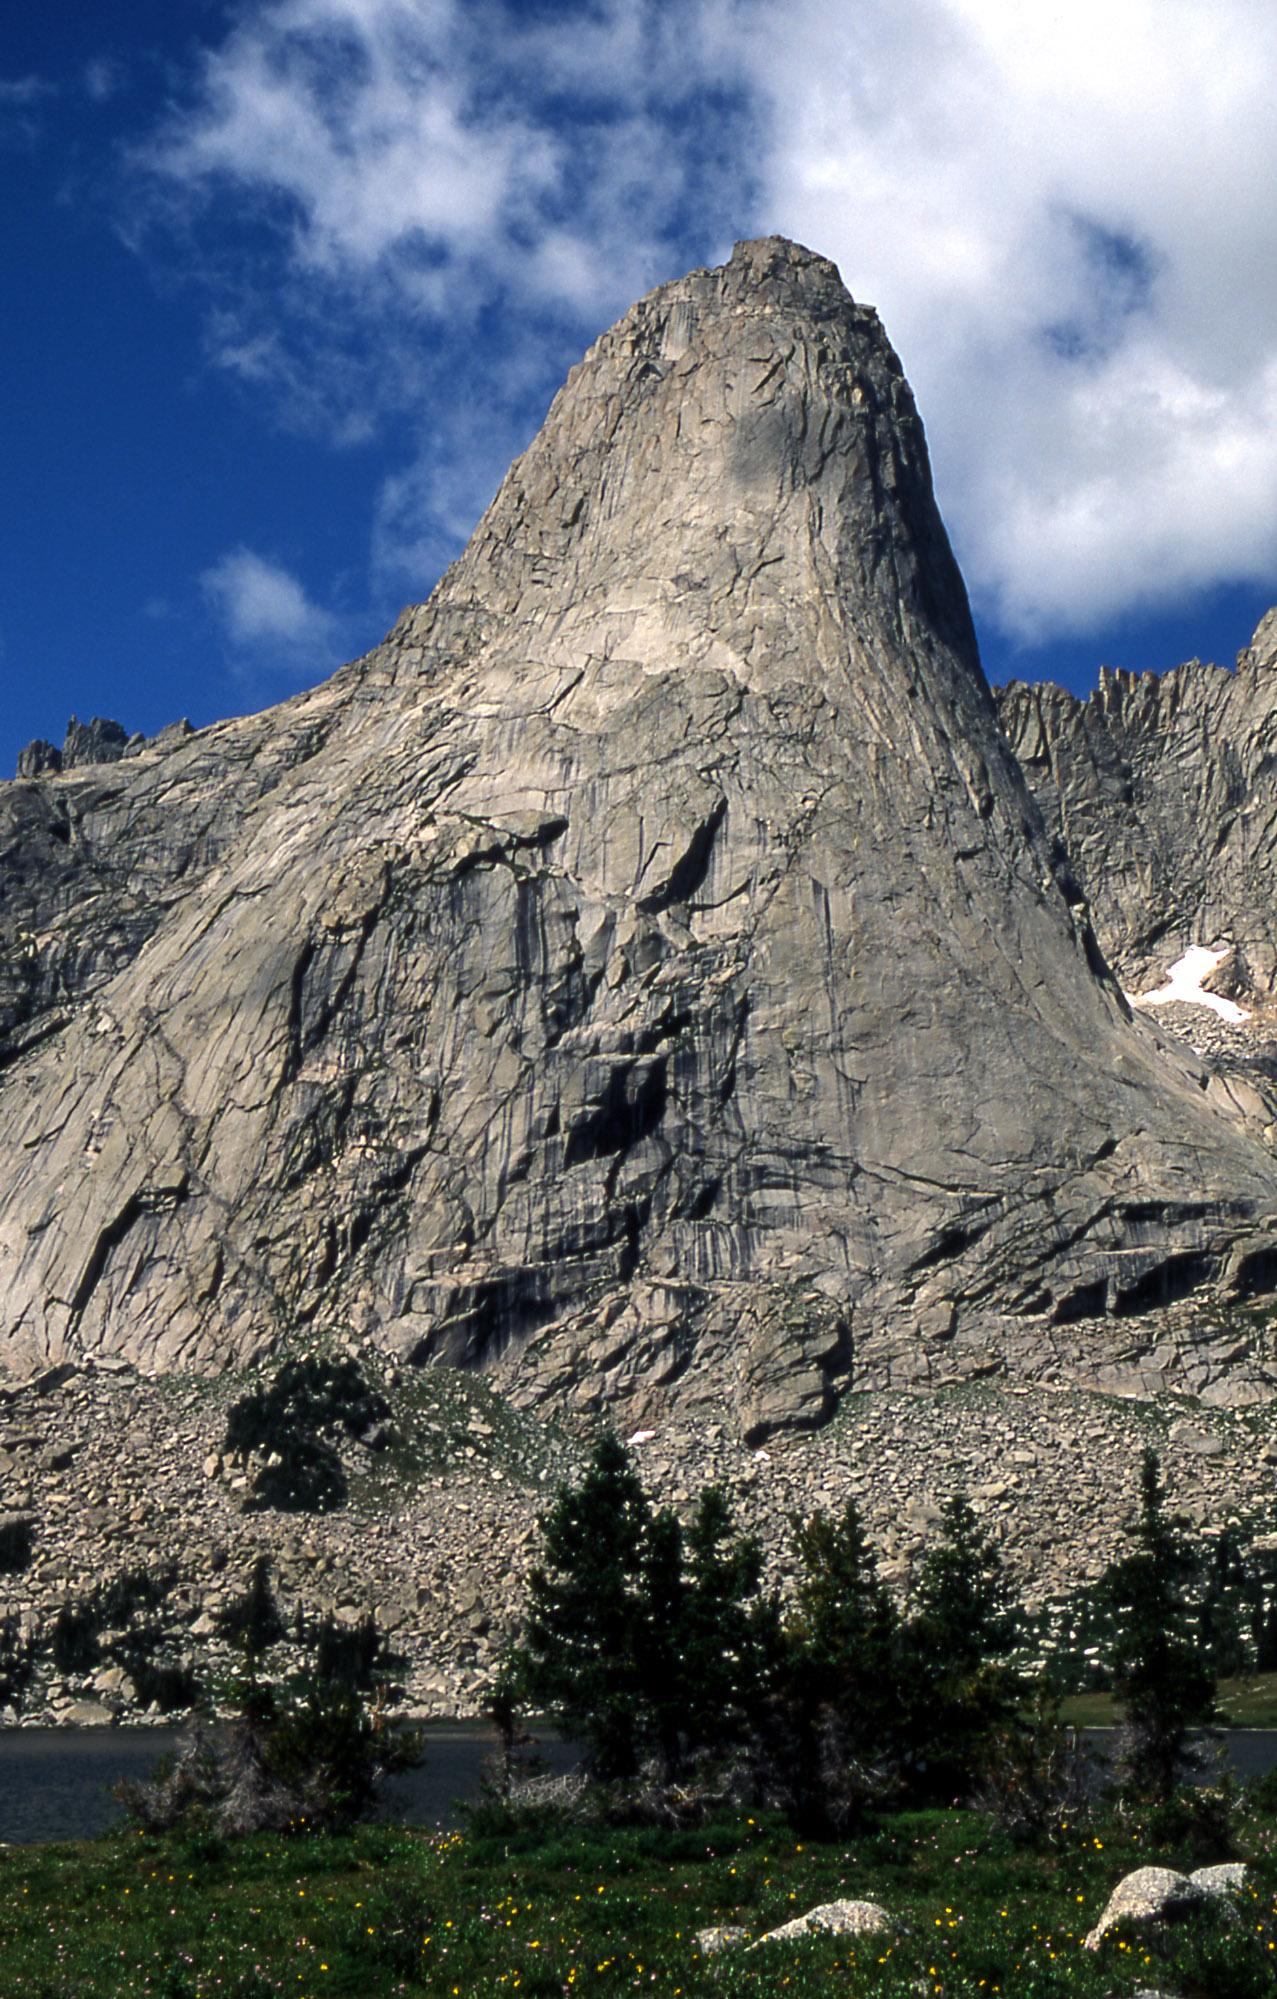 U S Lizard Pingora Peak - Wikiped...